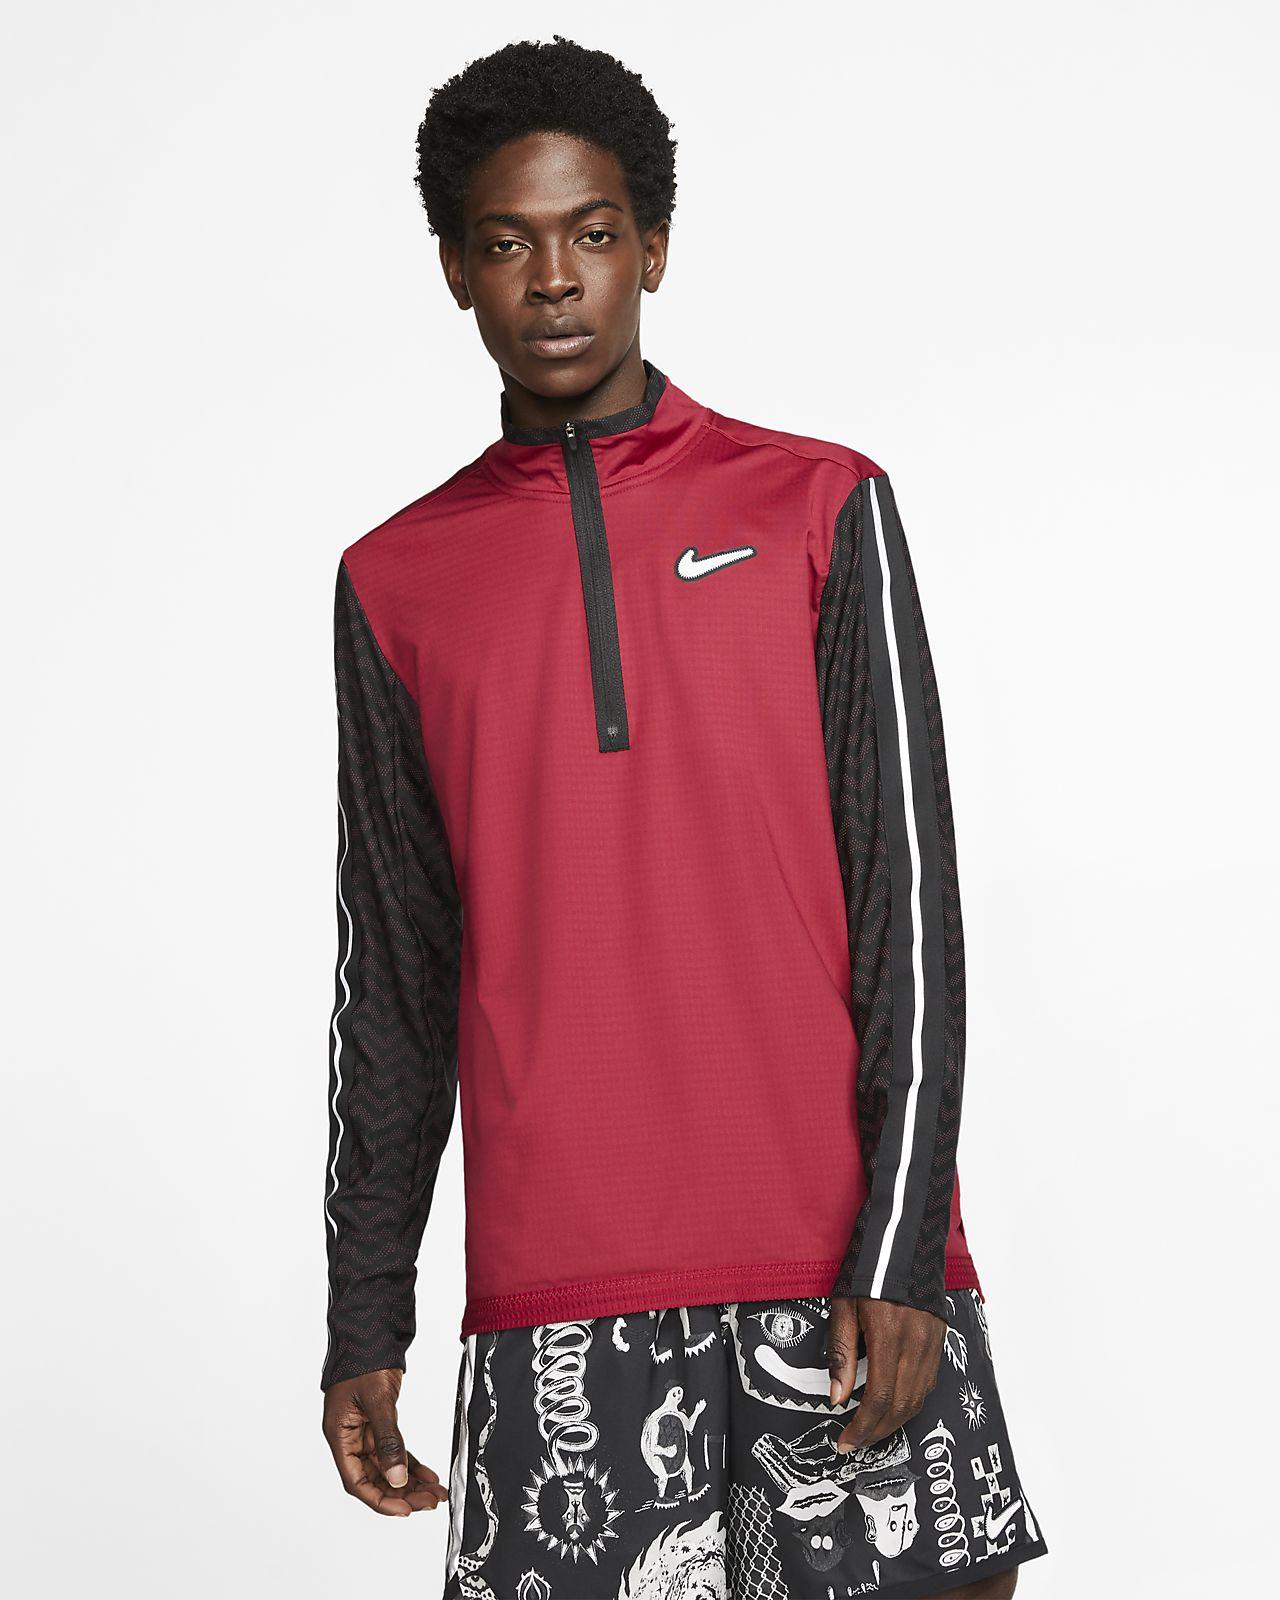 Nike Wild Run Men's Long-Sleeve Top